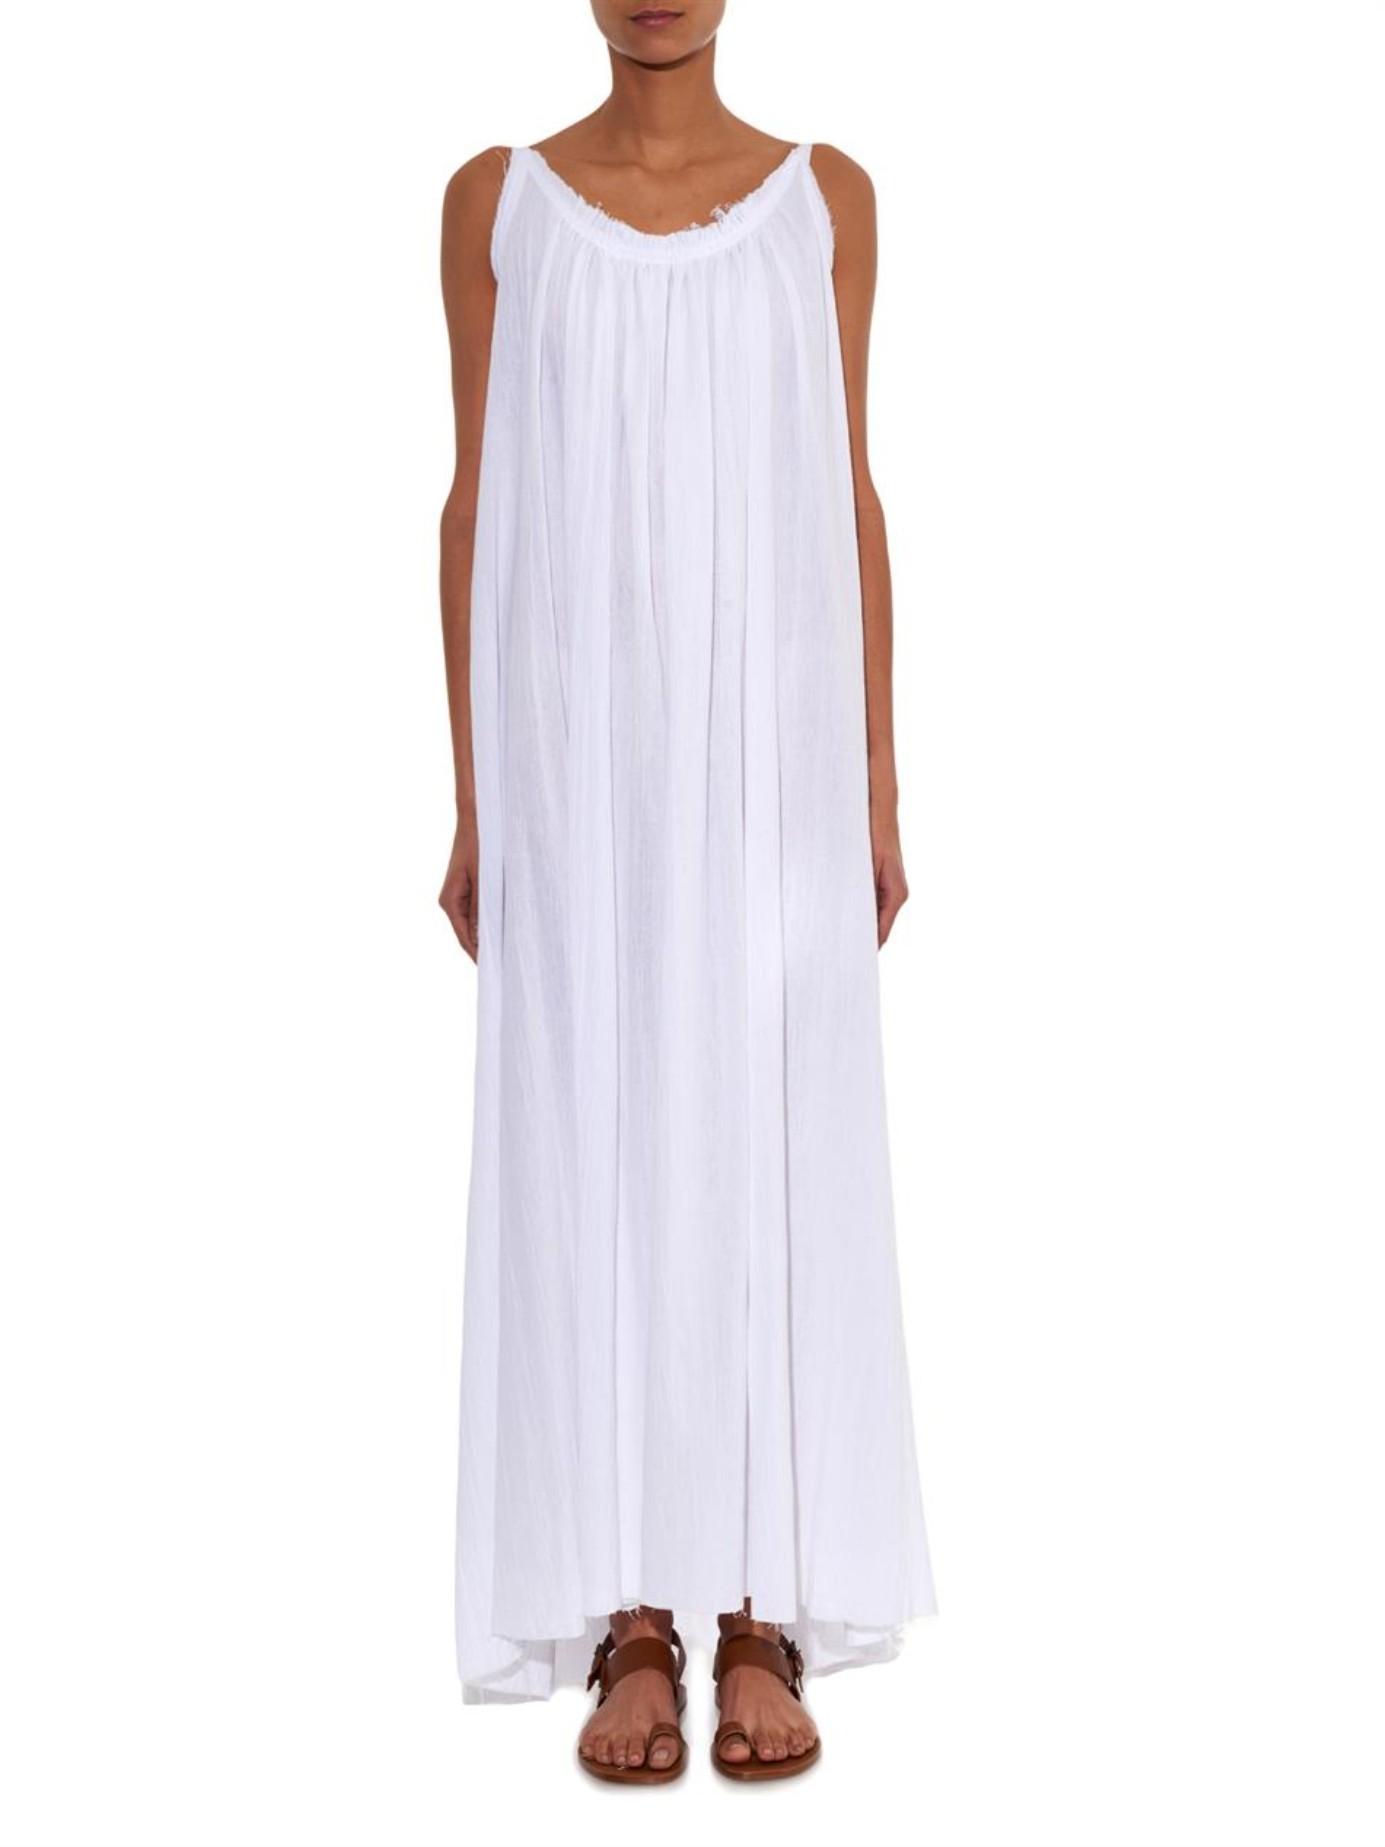 Lyst - Loup Charmant Cotton-Seersucker Maxi Dress in White